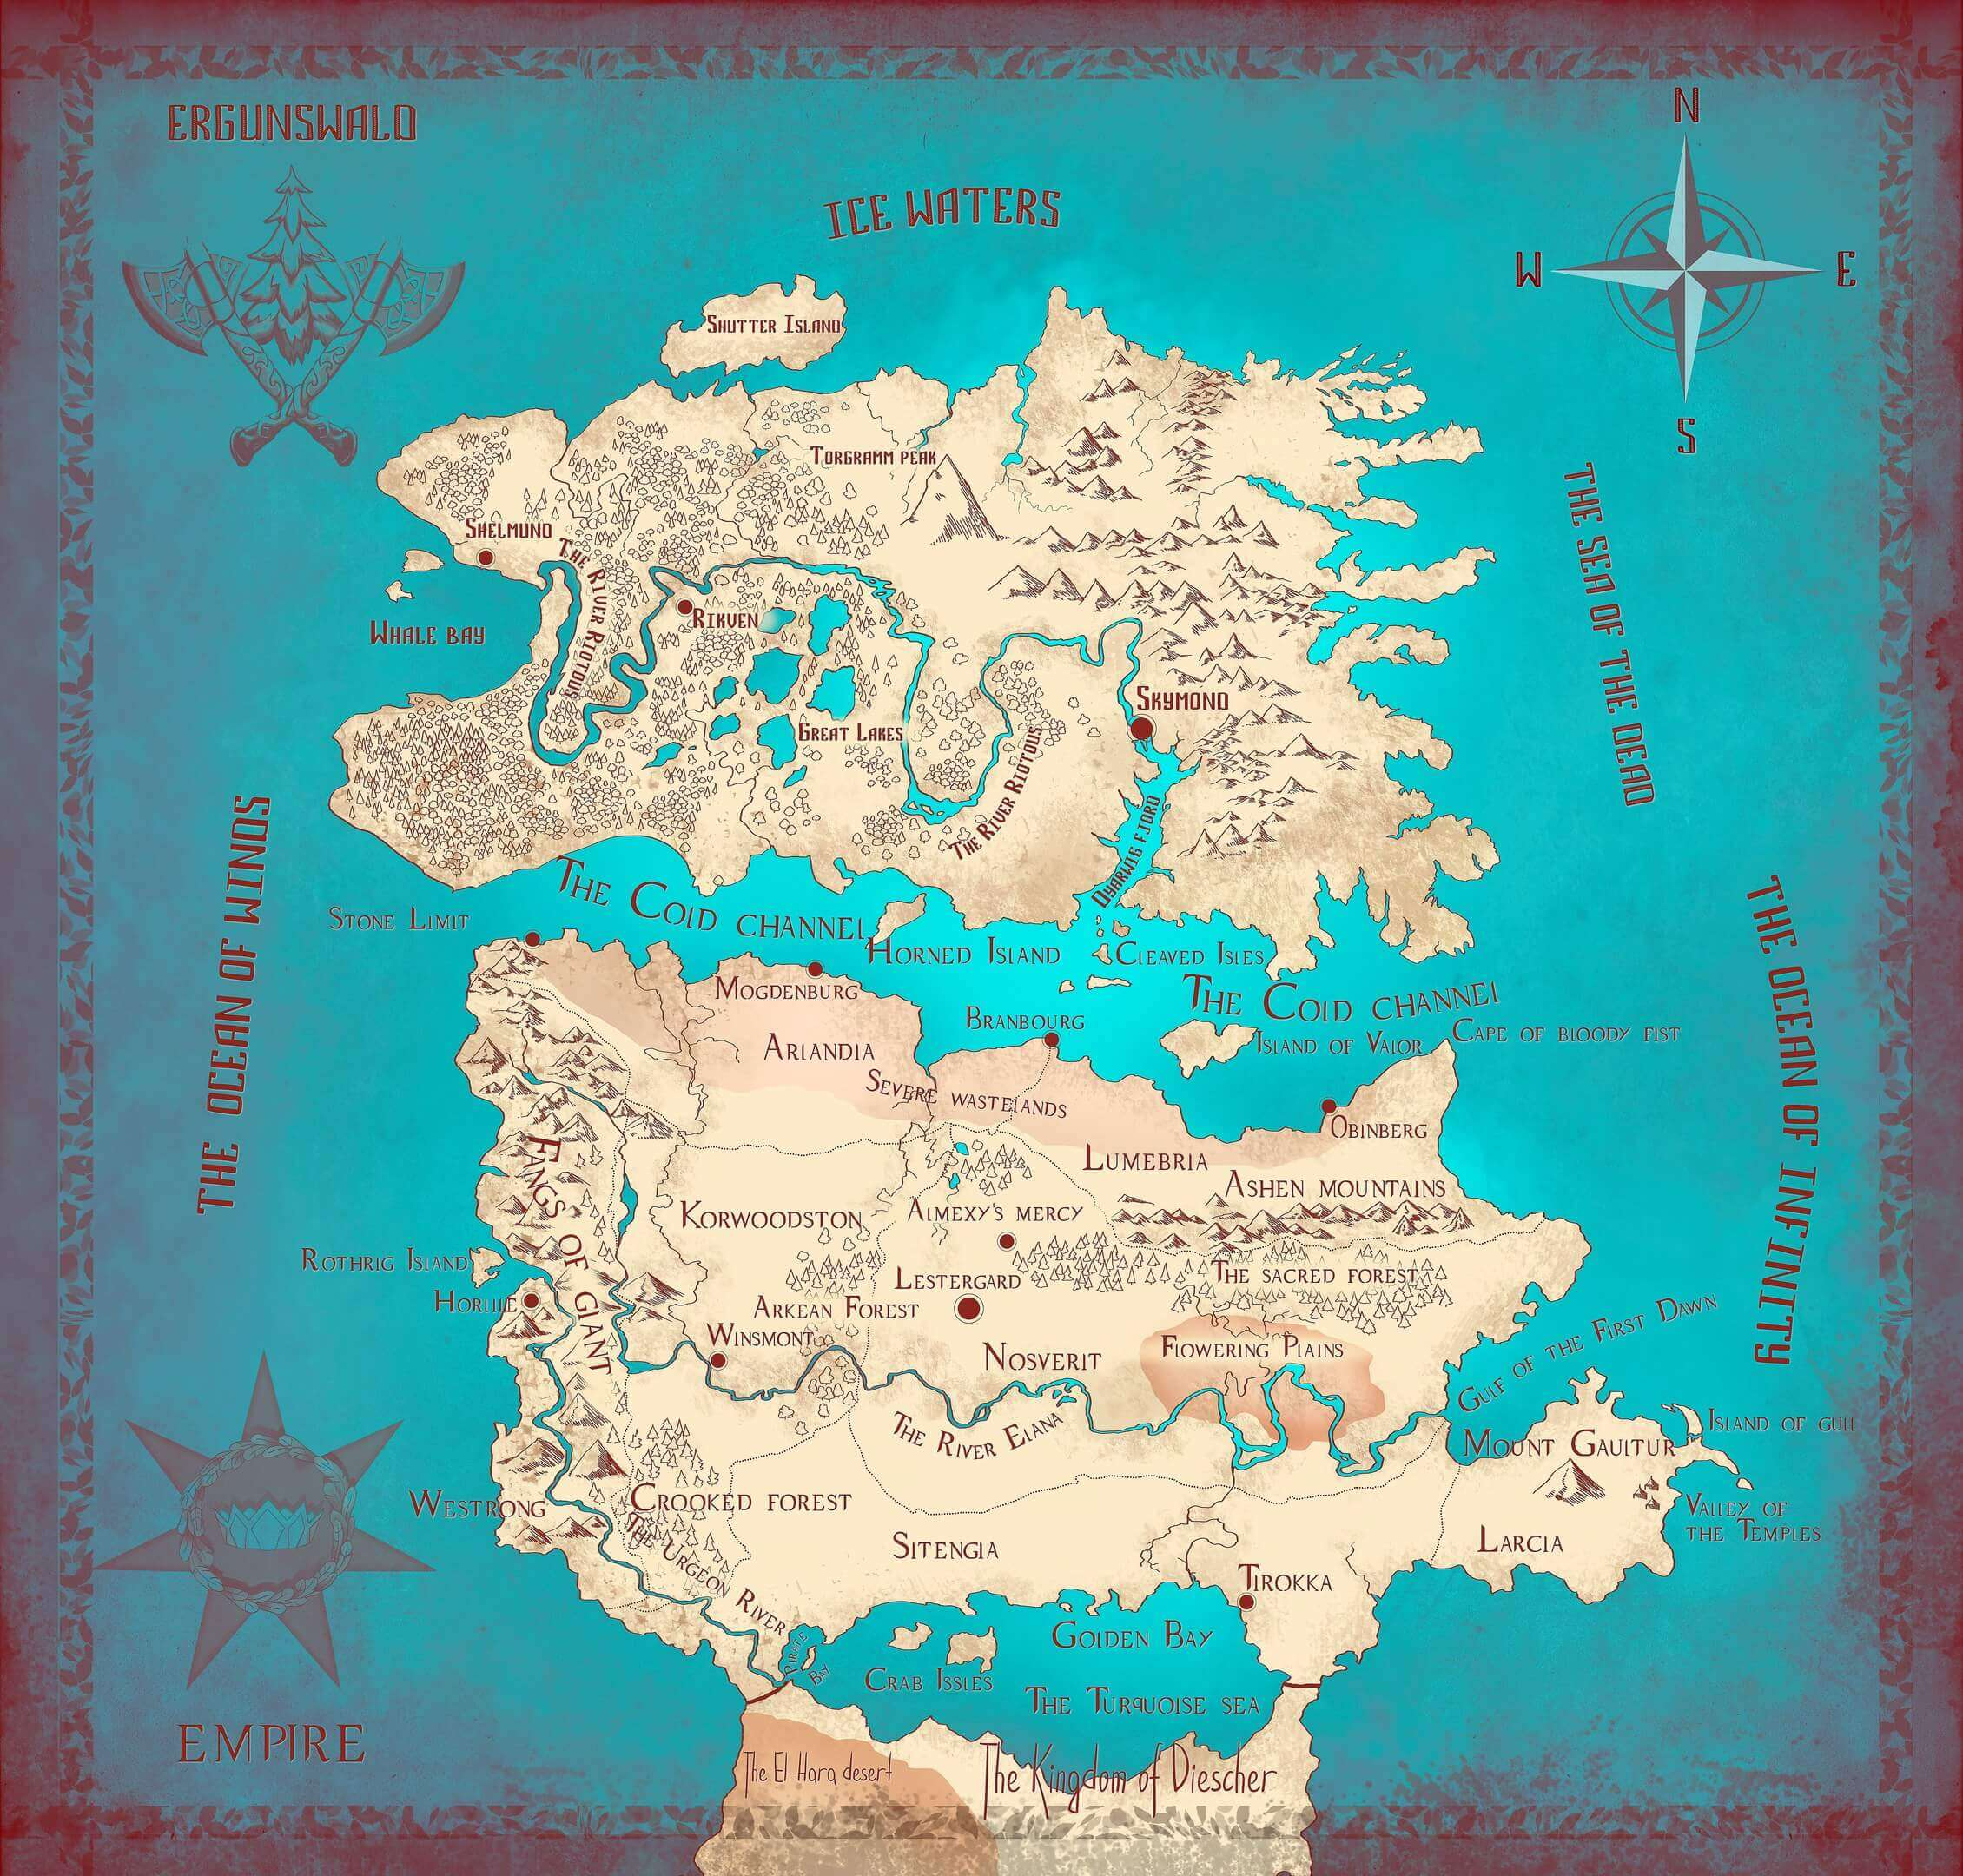 World Map Daniel Foster Official Website Of The Writer - Official world map